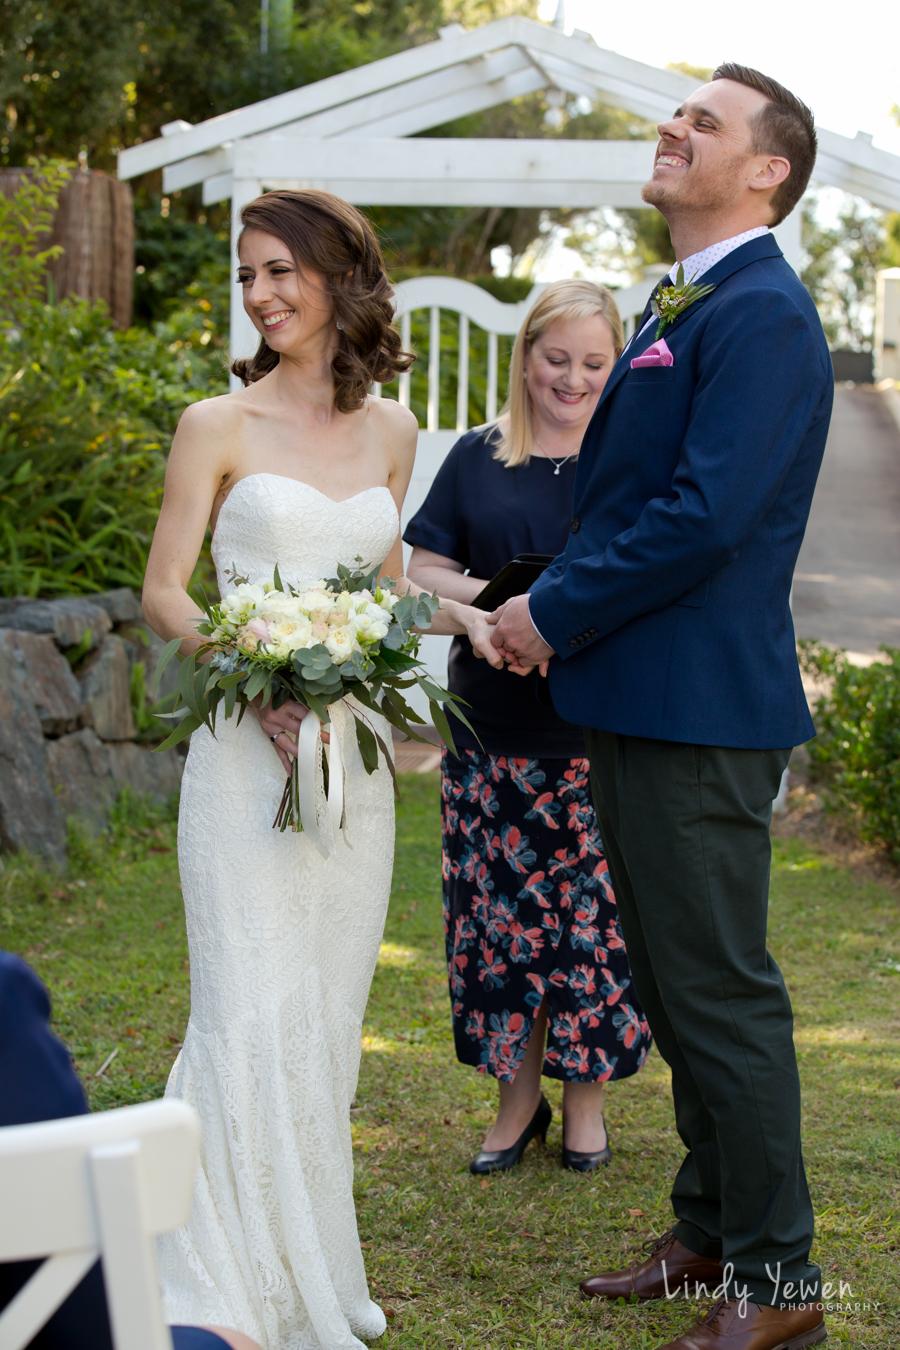 Montville-wedding-photographer-Lauren-Kirby 85.jpg